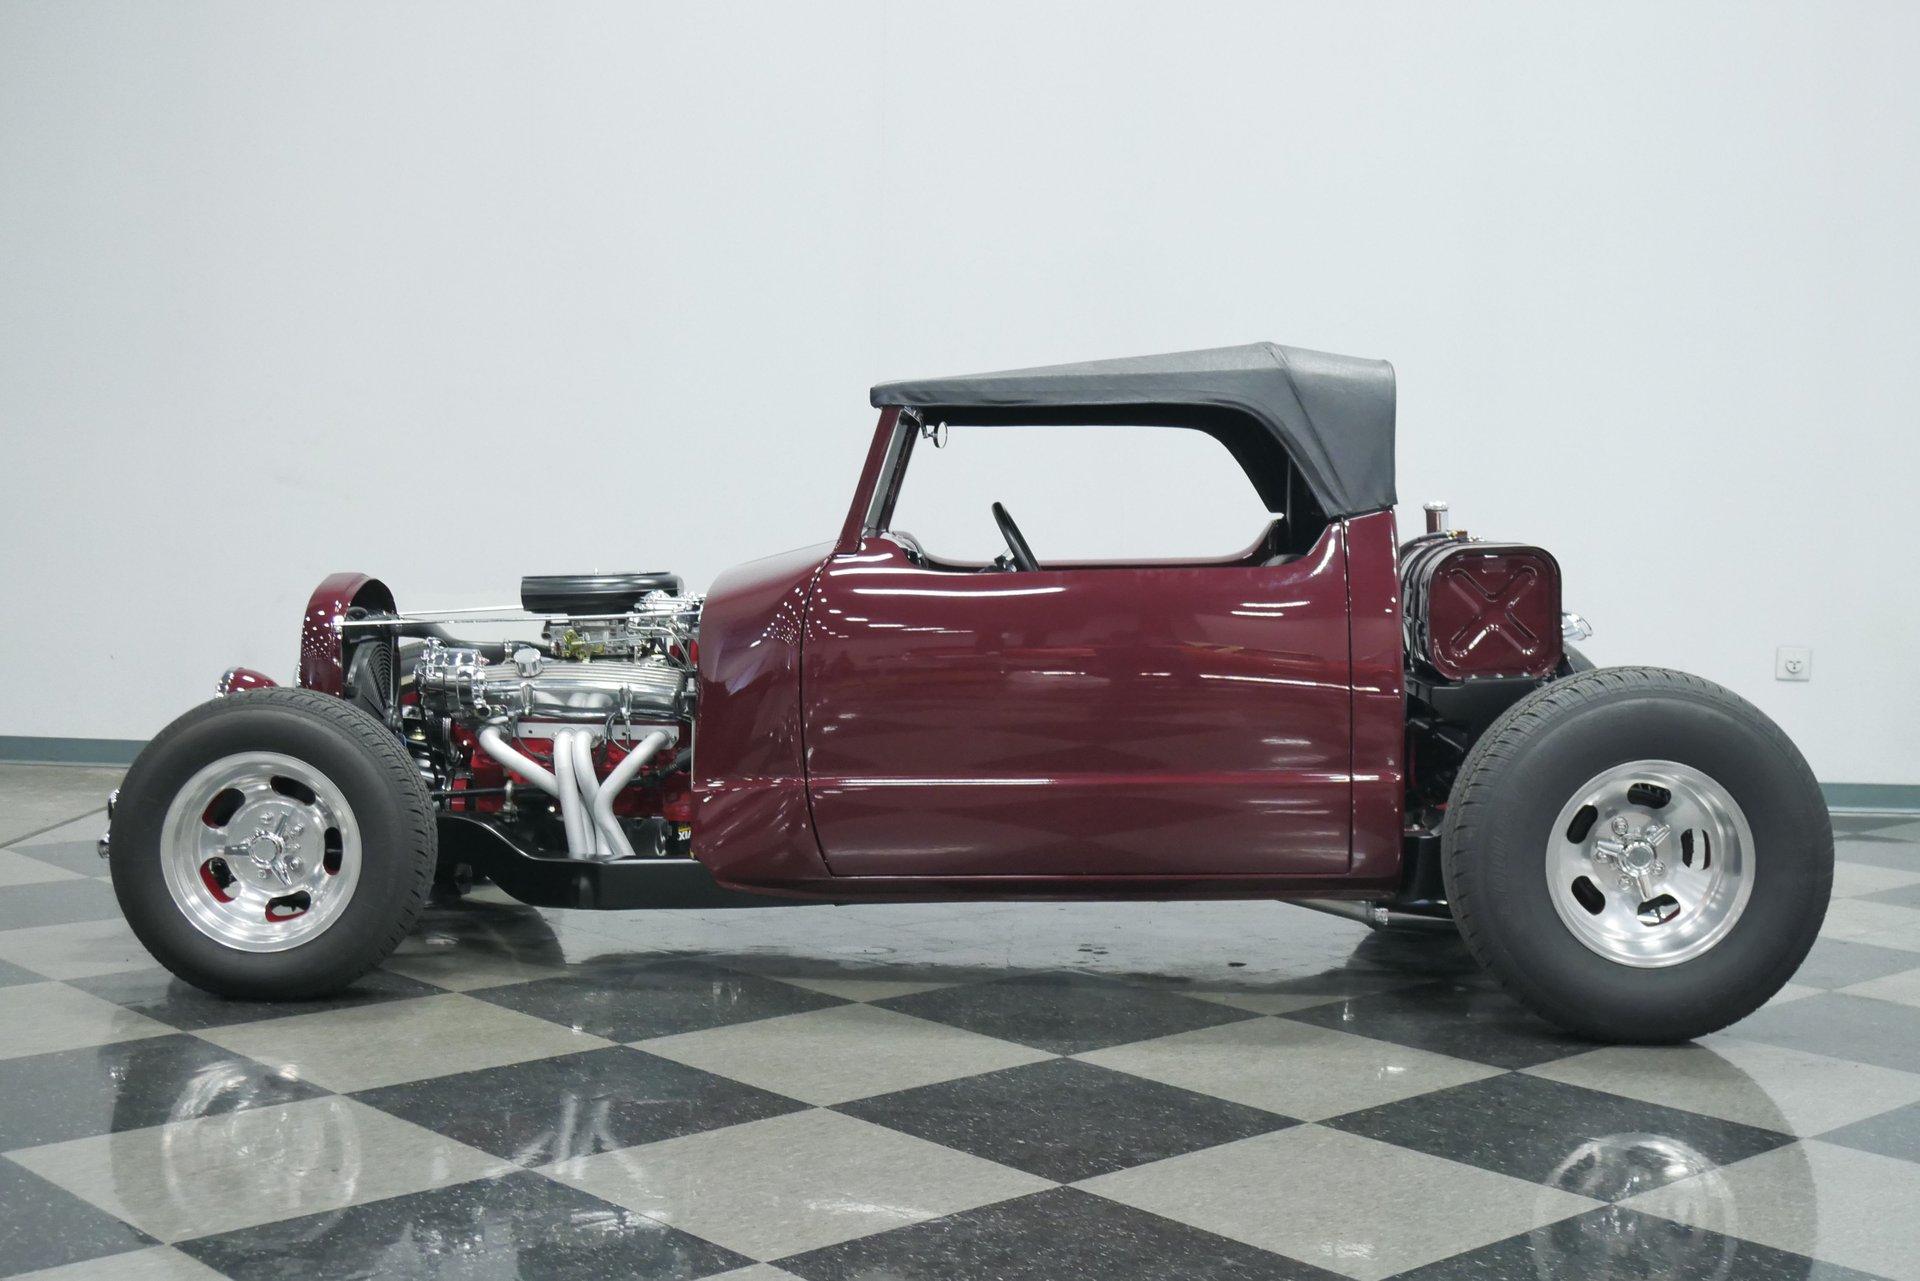 1987 chevrolet s 10 roadster